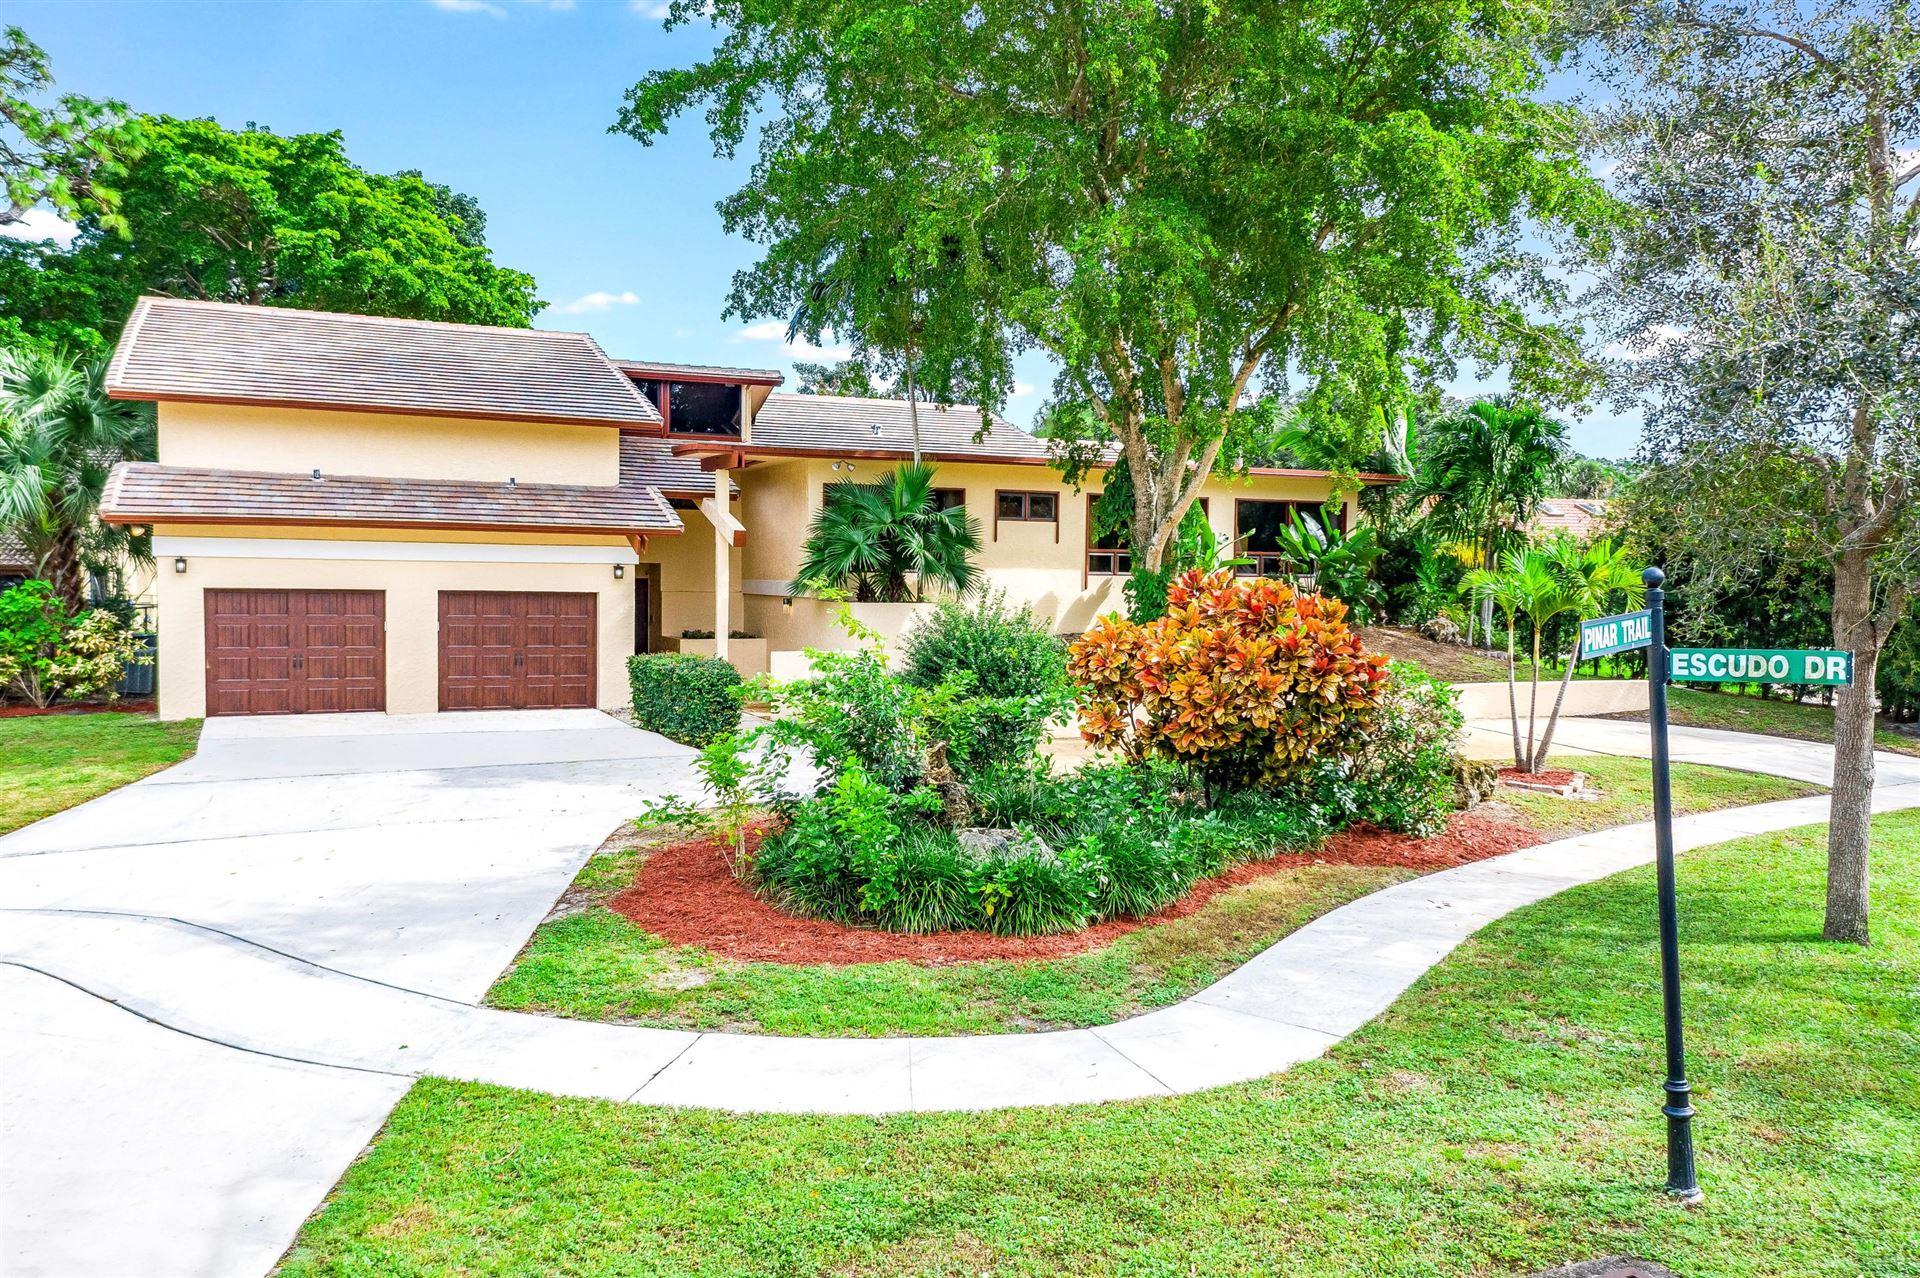 20912 Pinar Trail, Boca Raton, FL 33433 - #: RX-10671450